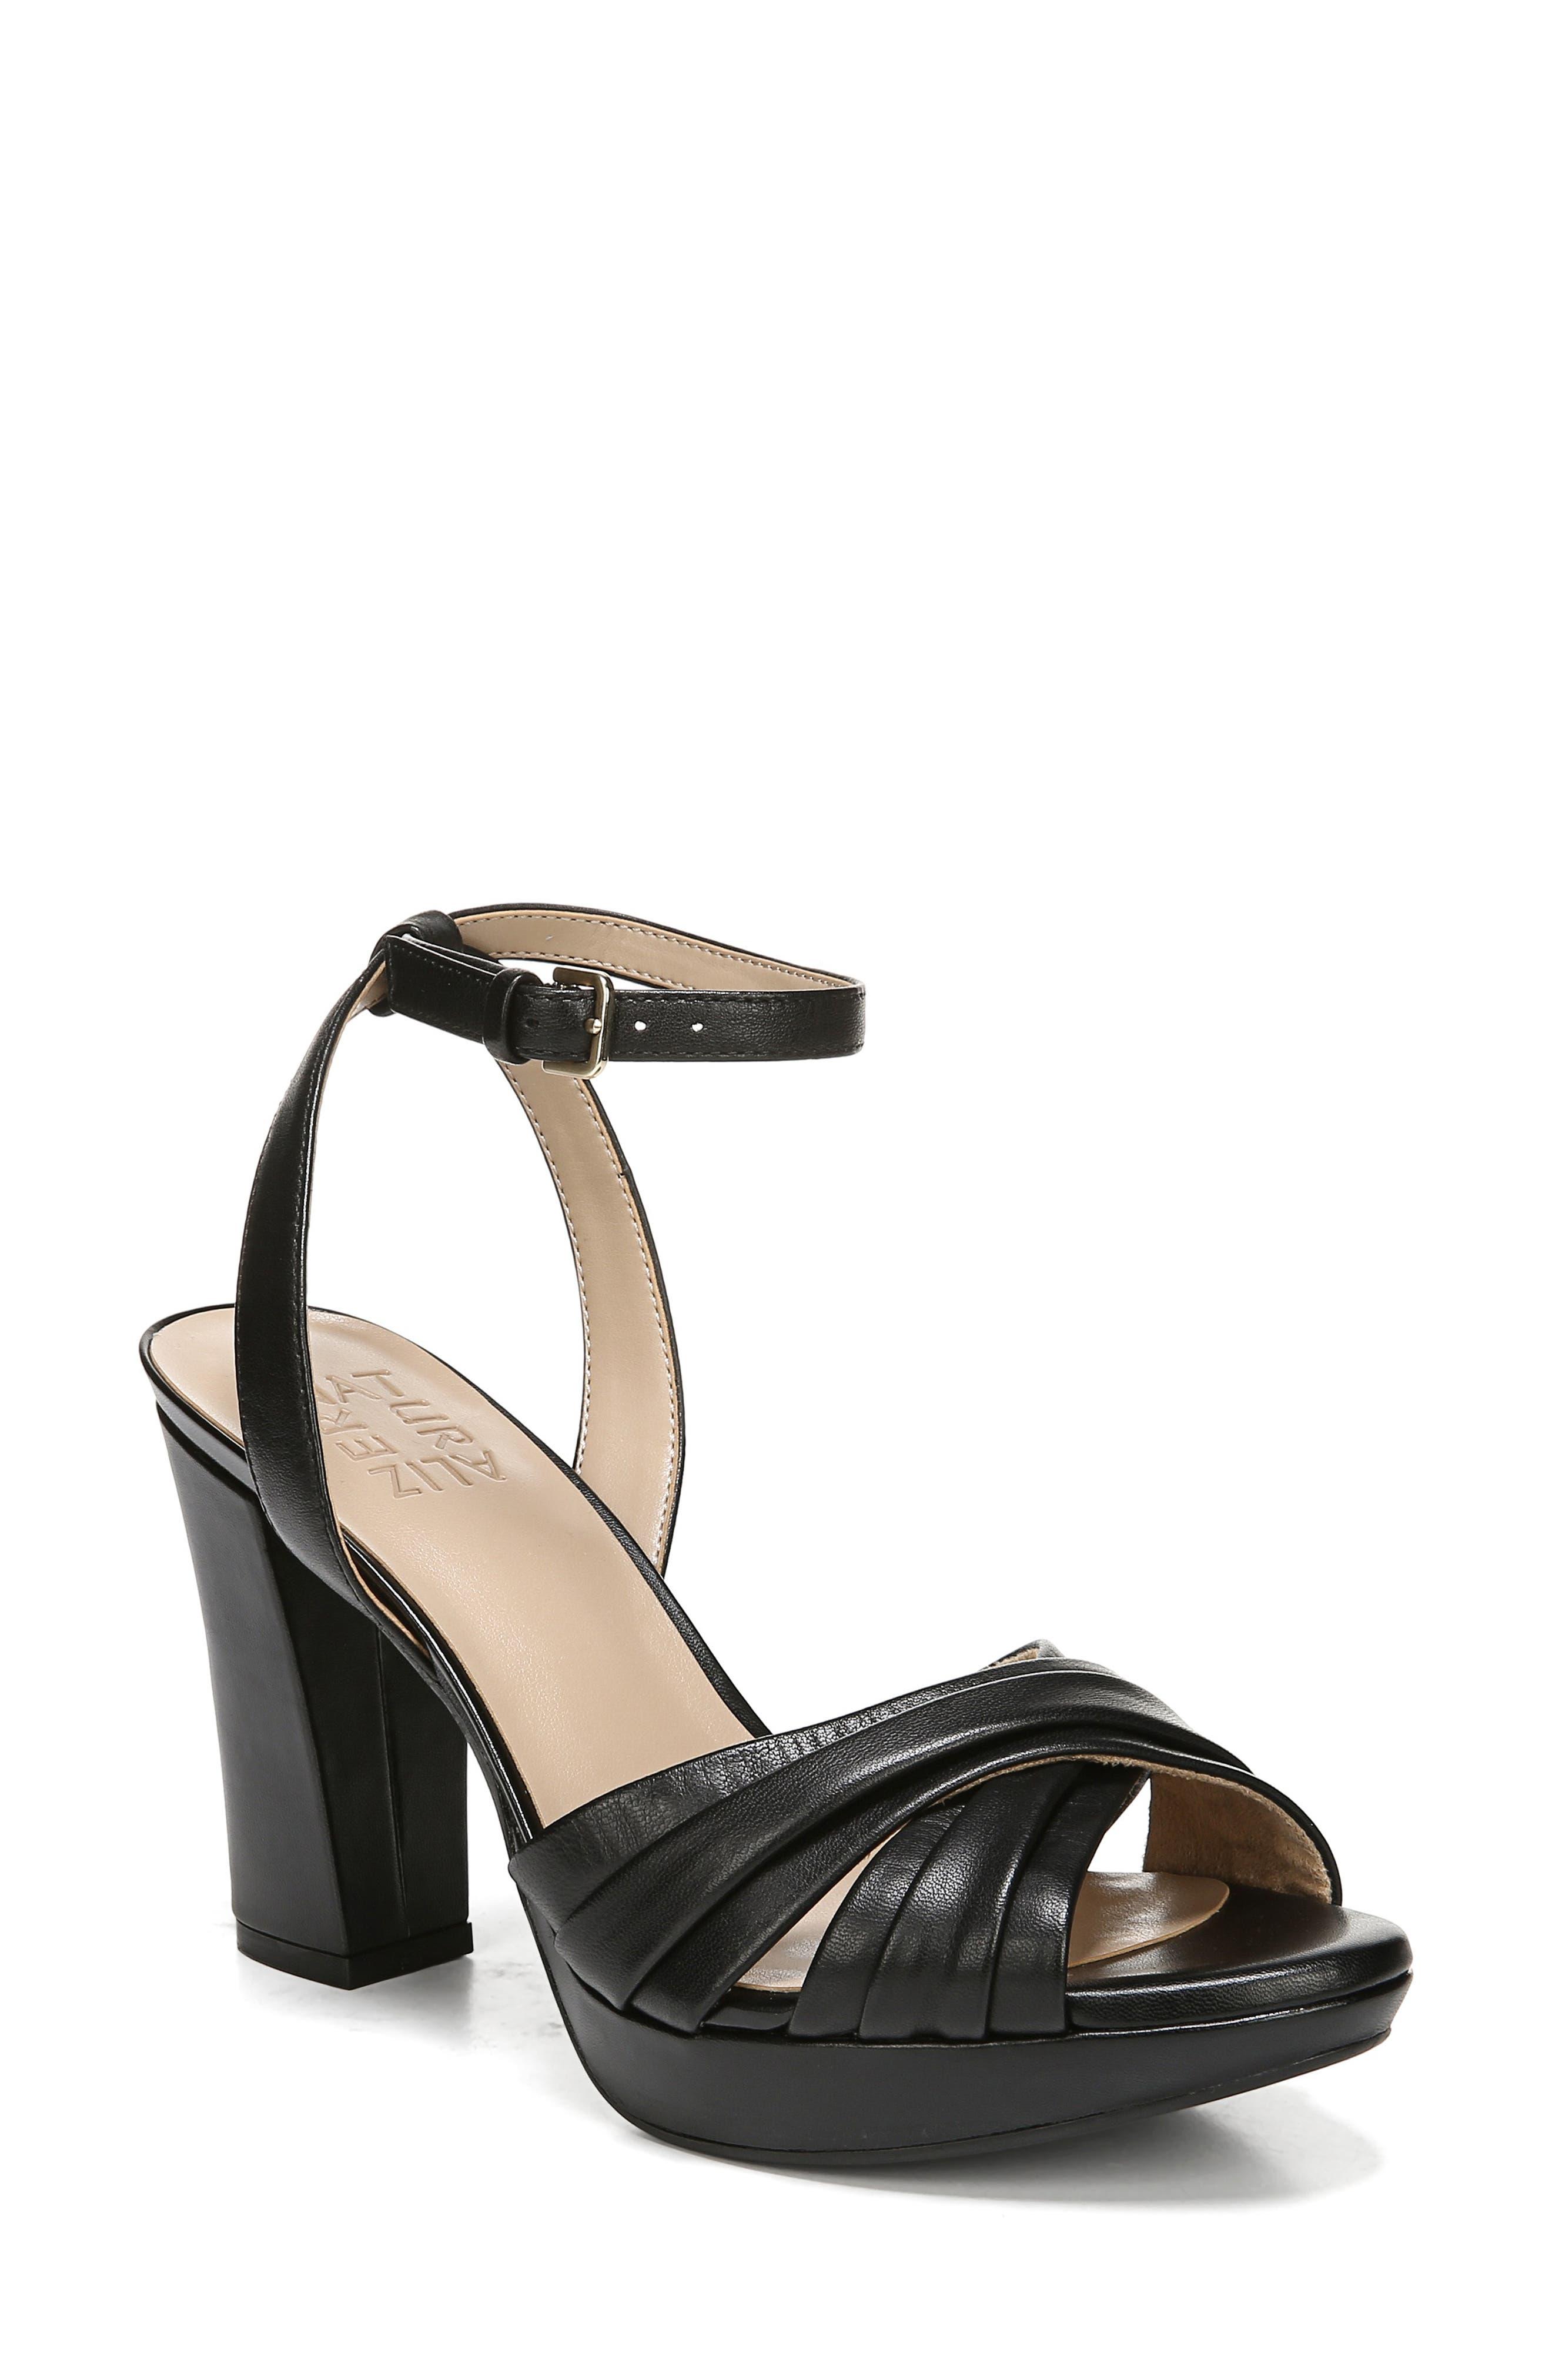 Naturalizer Avril Ankle Strap Sandal- Black